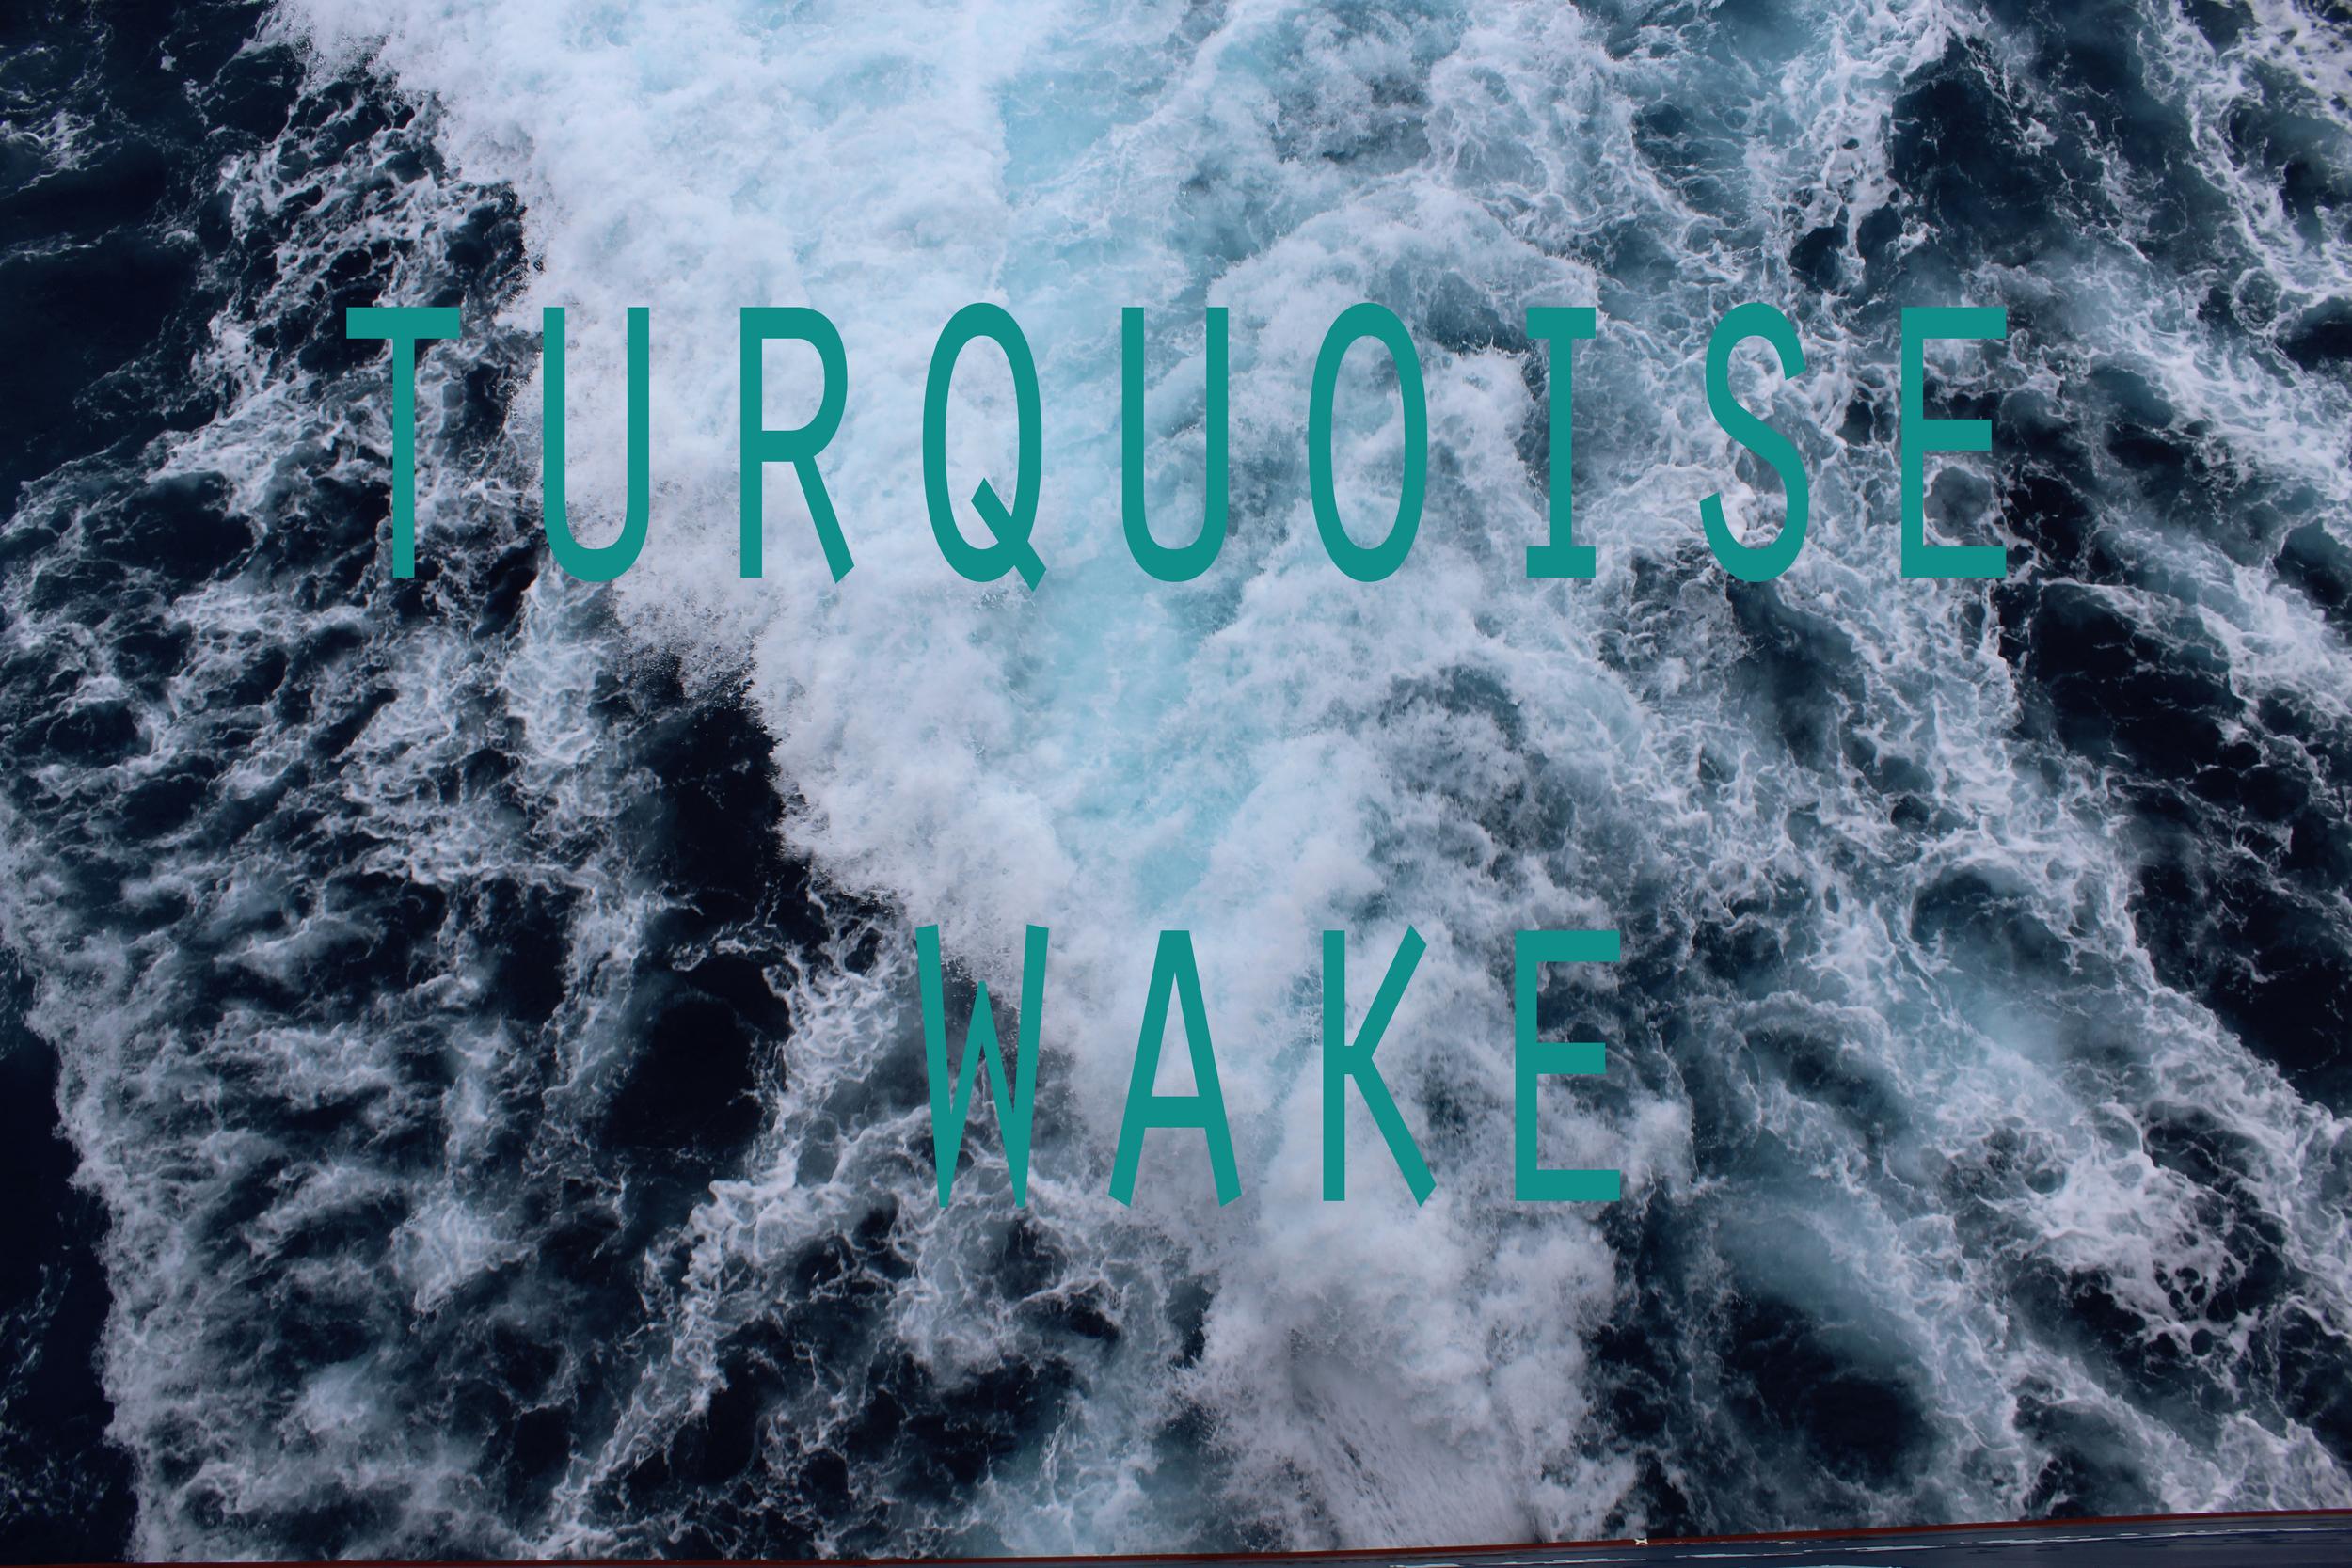 test turquoise-1.jpg